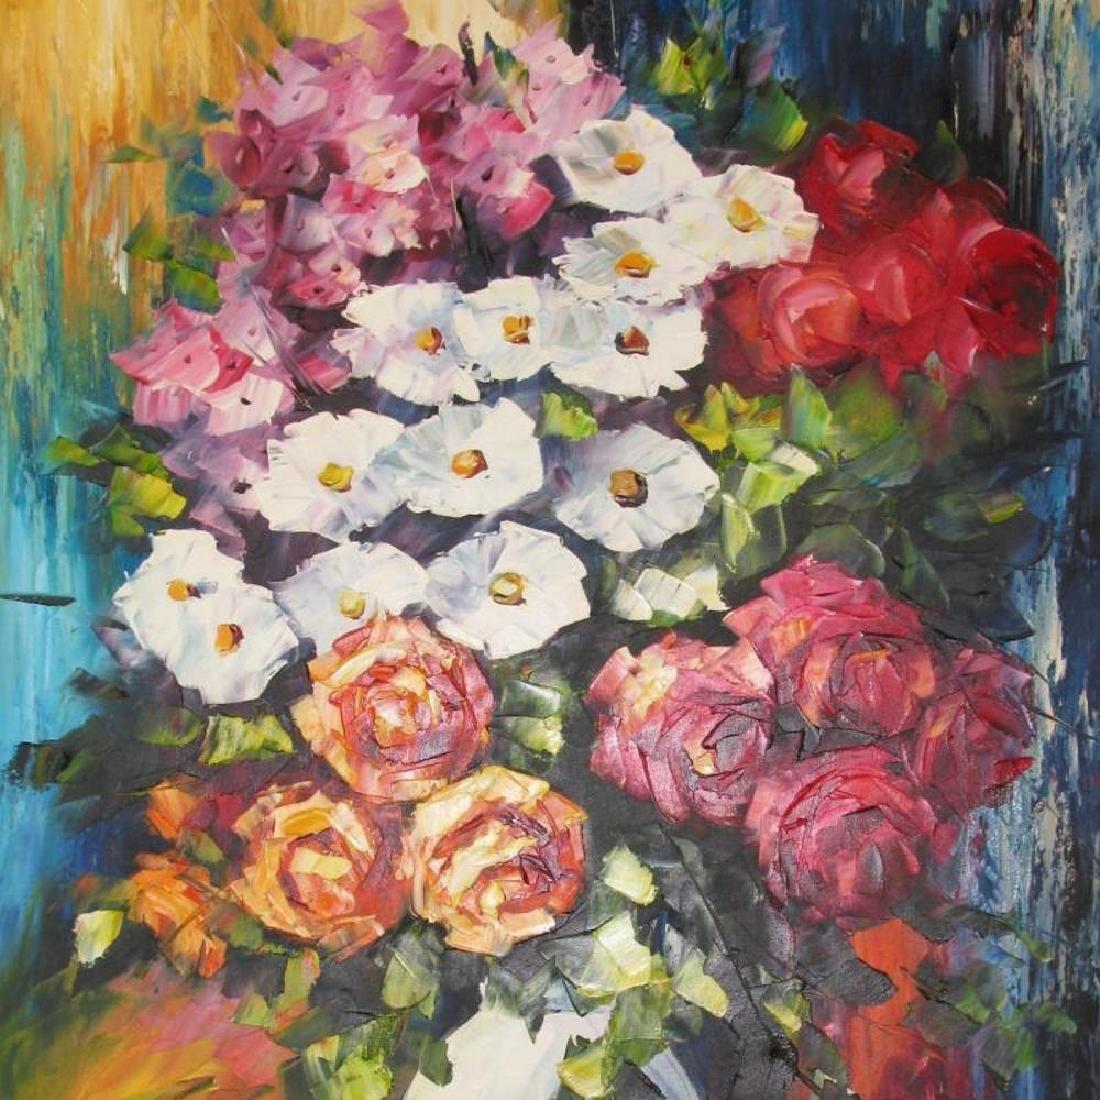 Colorful Floral Vase Textures Bold Original Canvas - 3